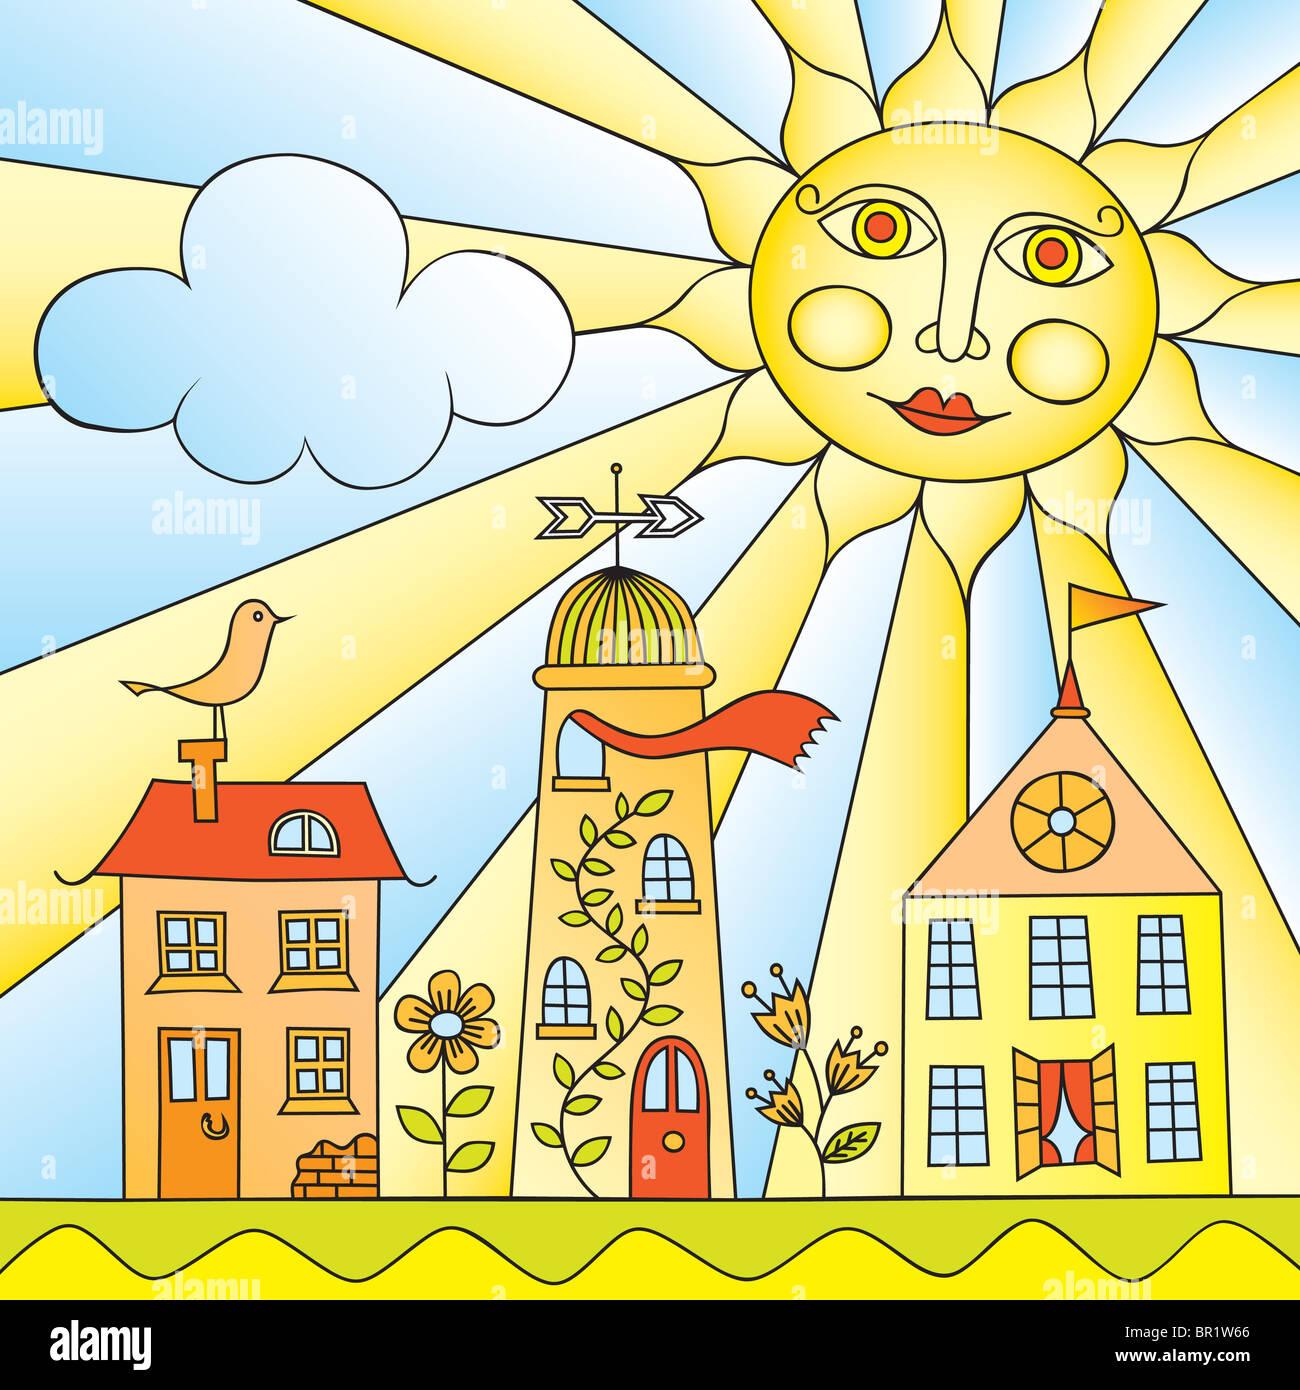 City under Sun - Stock Image